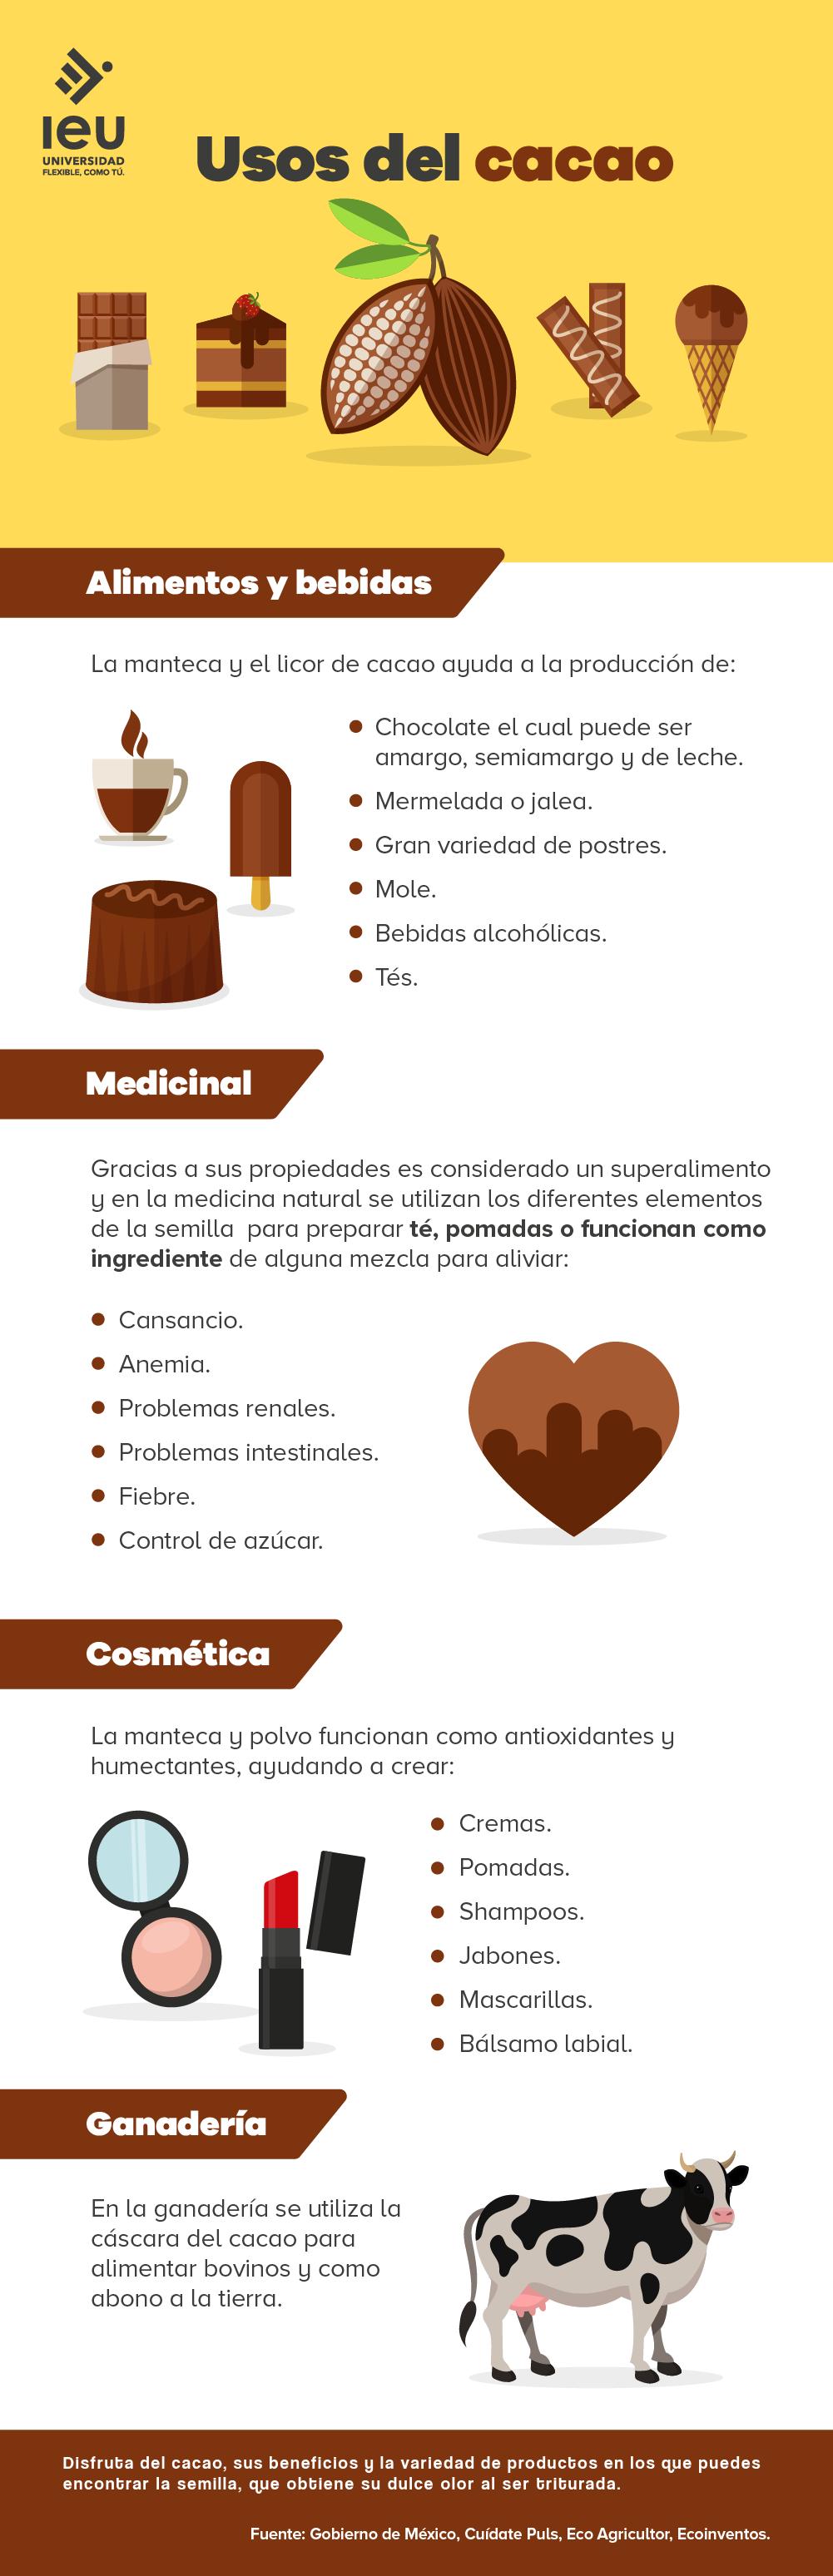 usos del cacao infografia